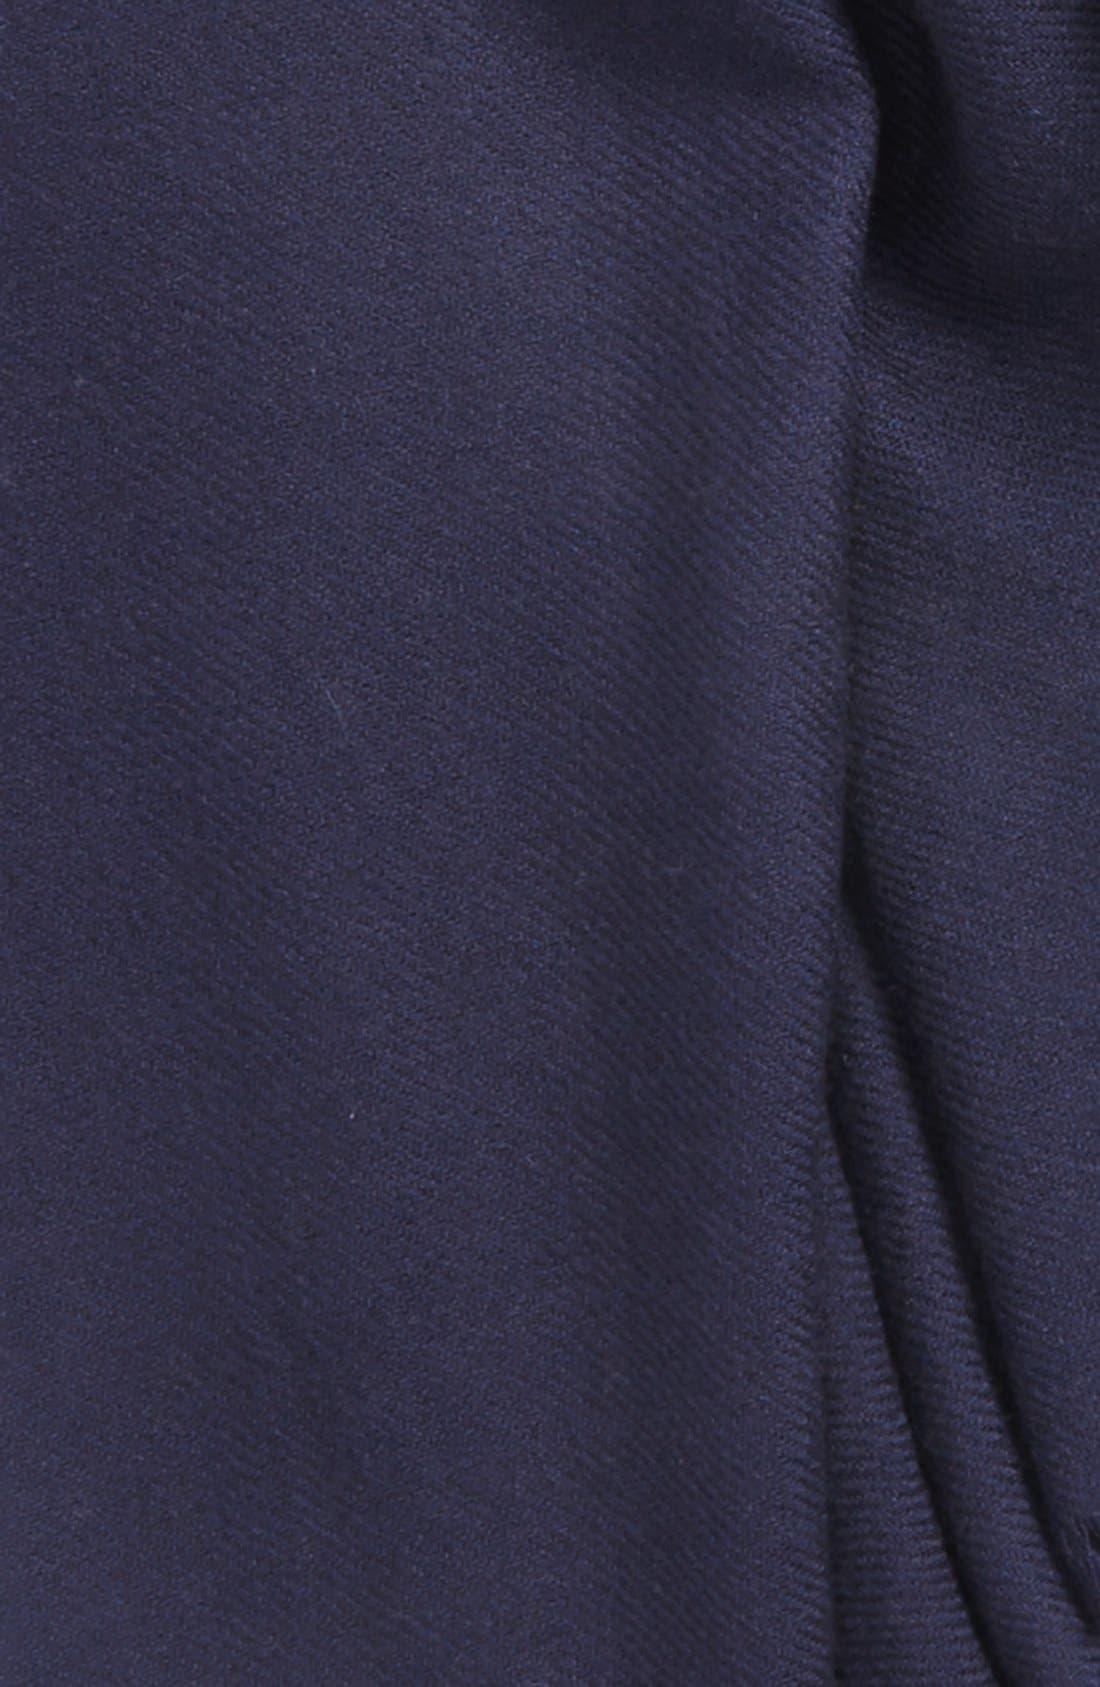 Wool & Cashmere Wrap,                             Alternate thumbnail 52, color,